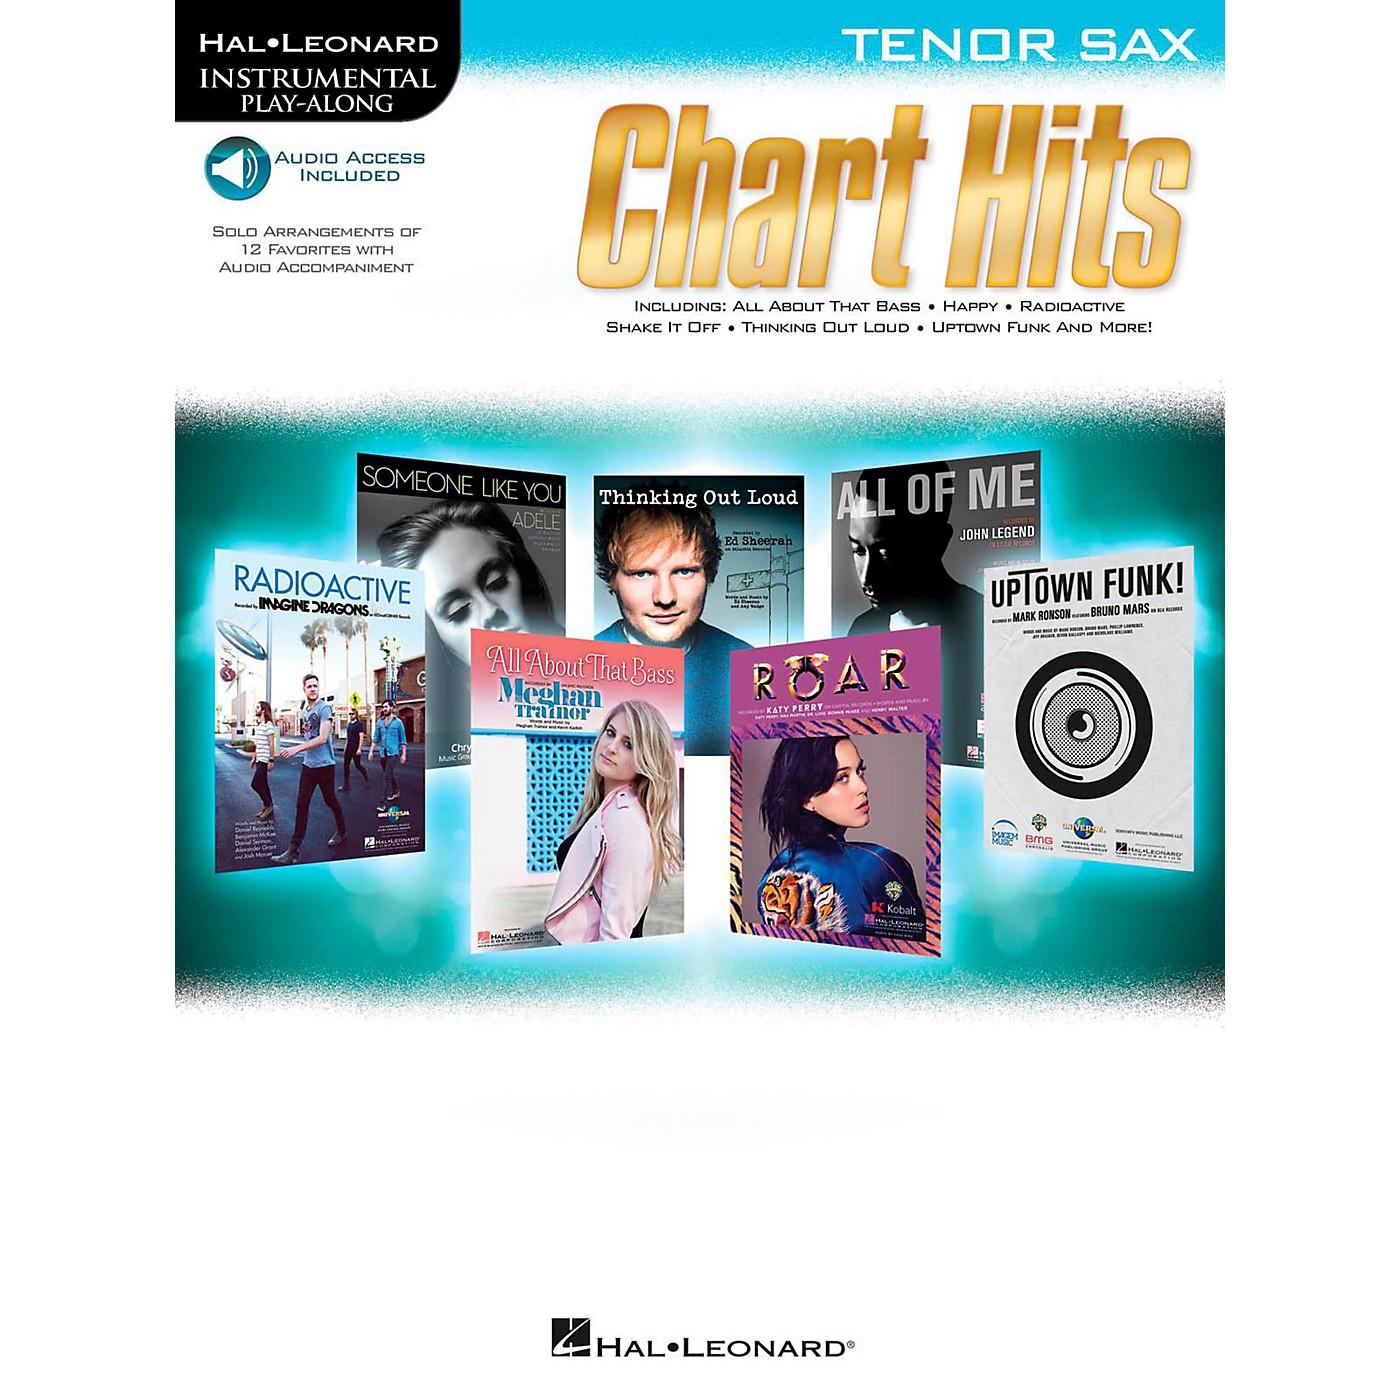 Hal Leonard Chart Hits For Tenor Sax - Instrumental Play-Along (Book/Online Audio) thumbnail